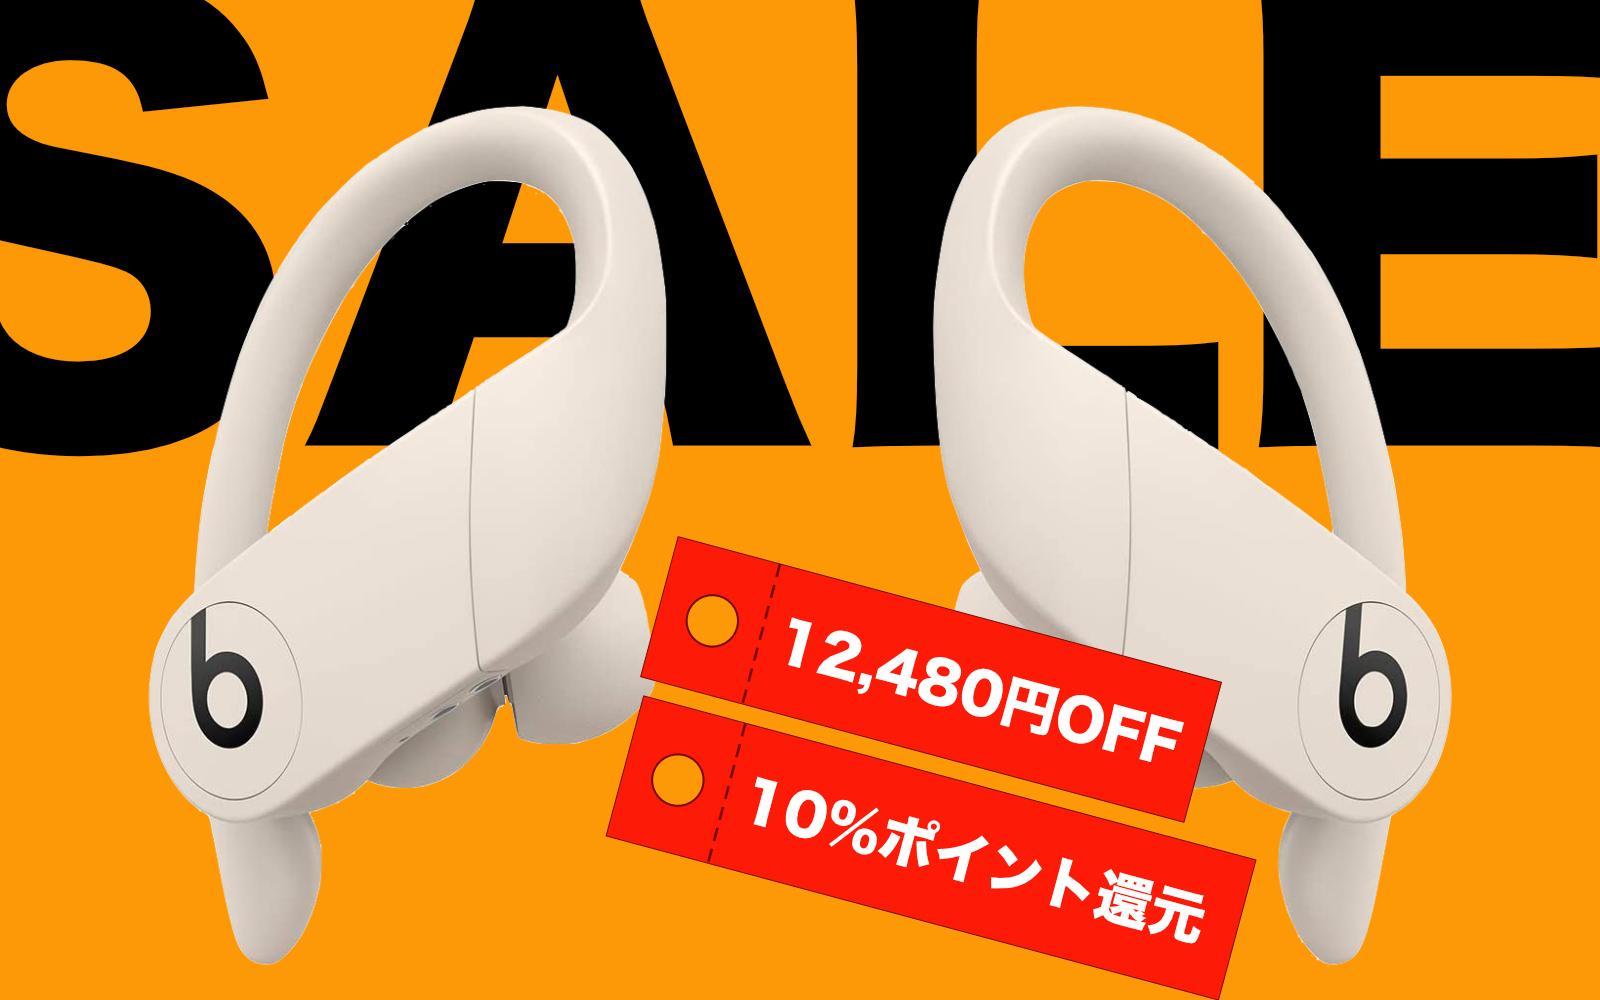 Powerbeats Pro on sale